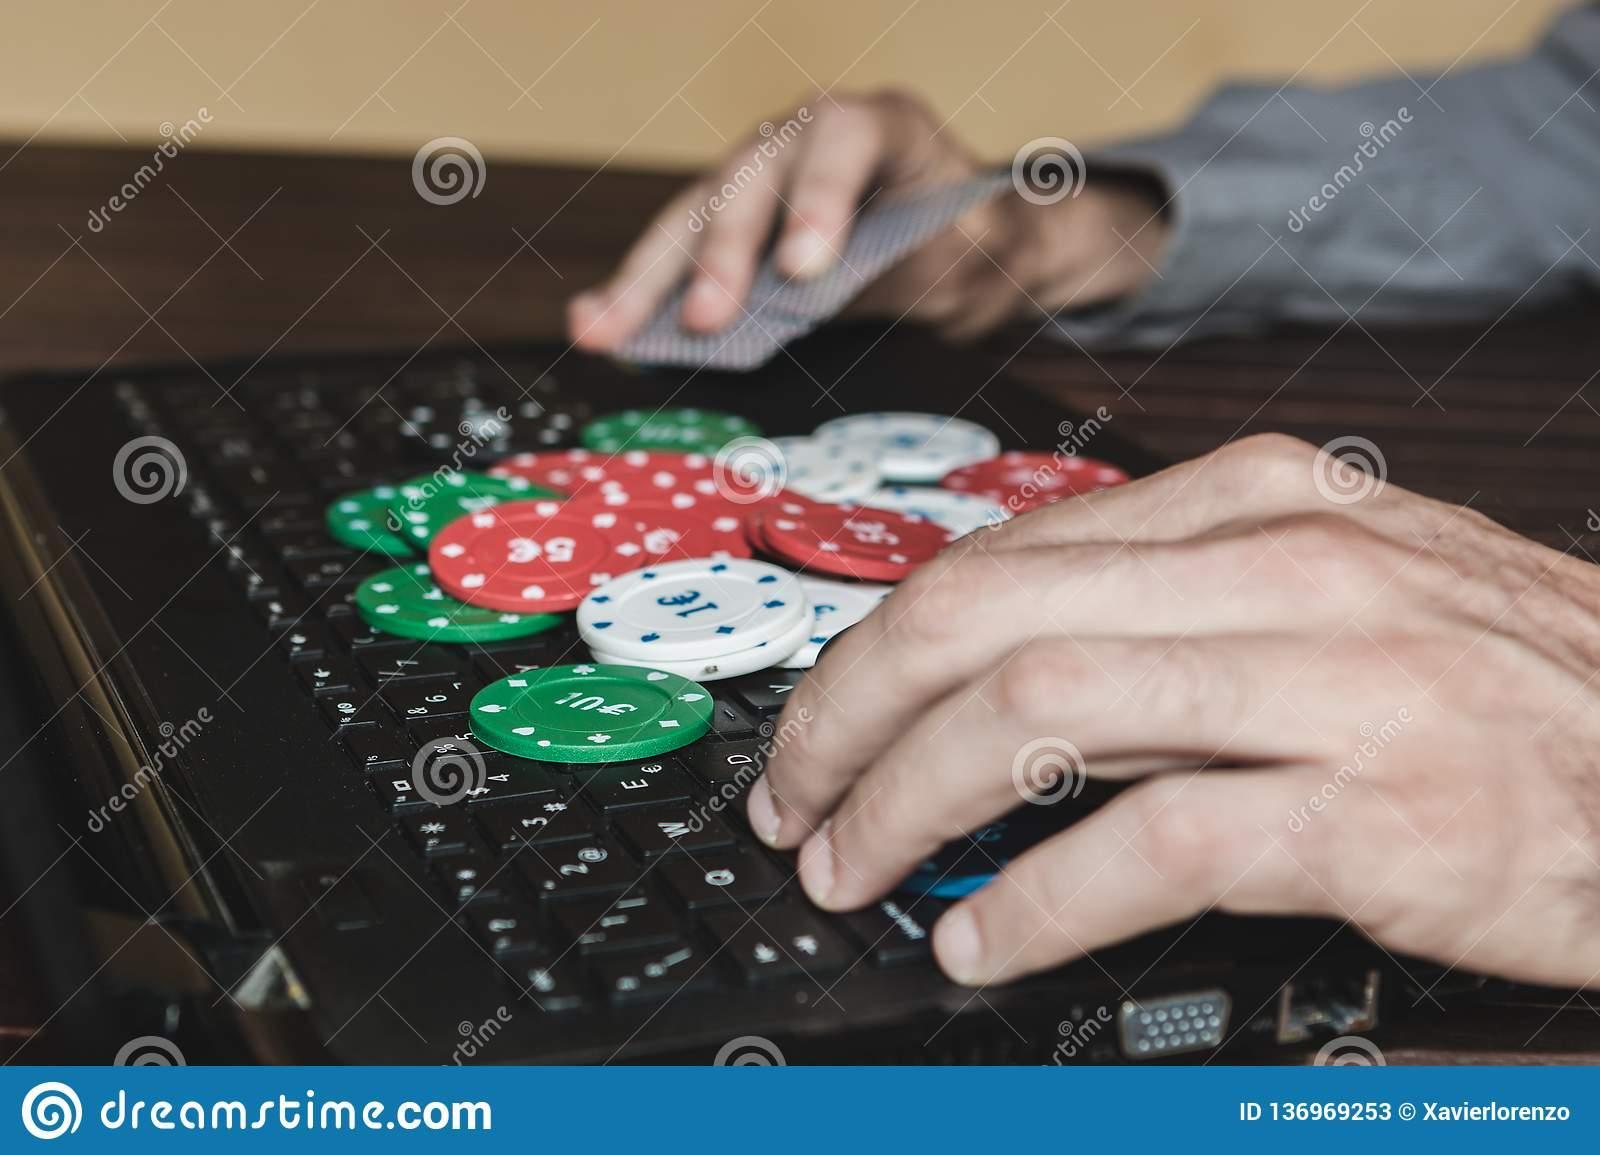 poker idea